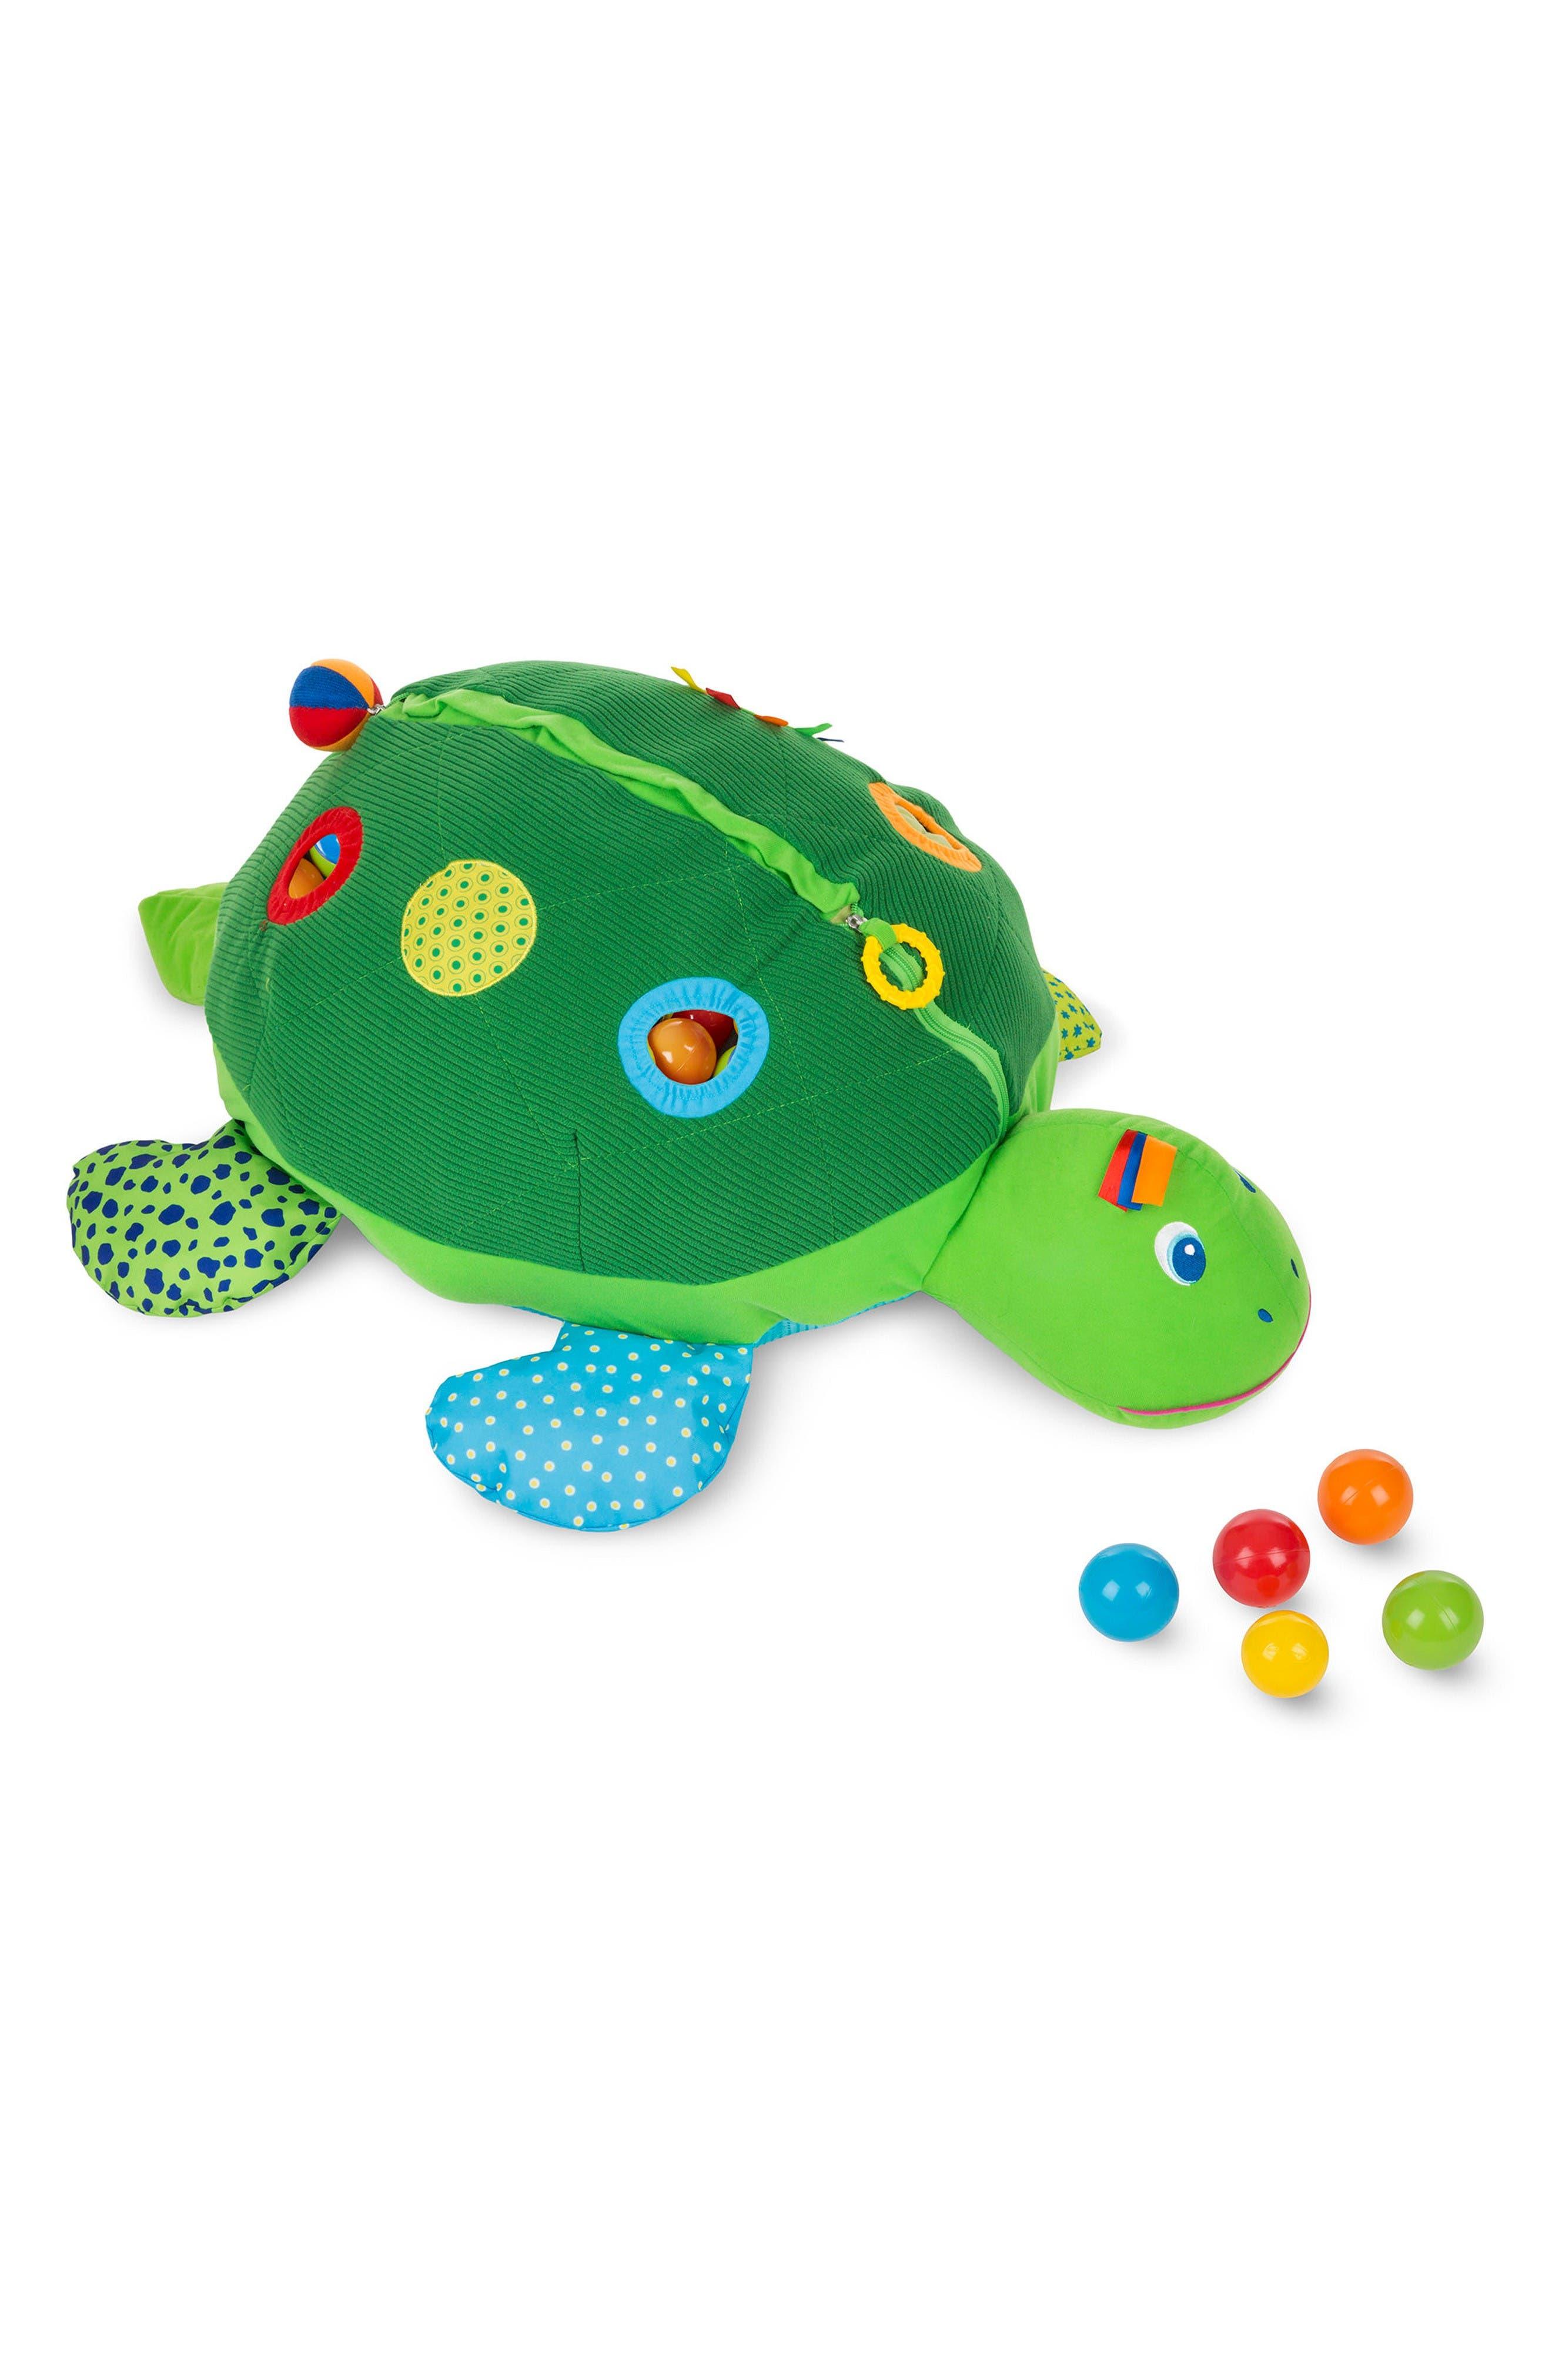 MELISSA & DOUG Turtle Ball Pit